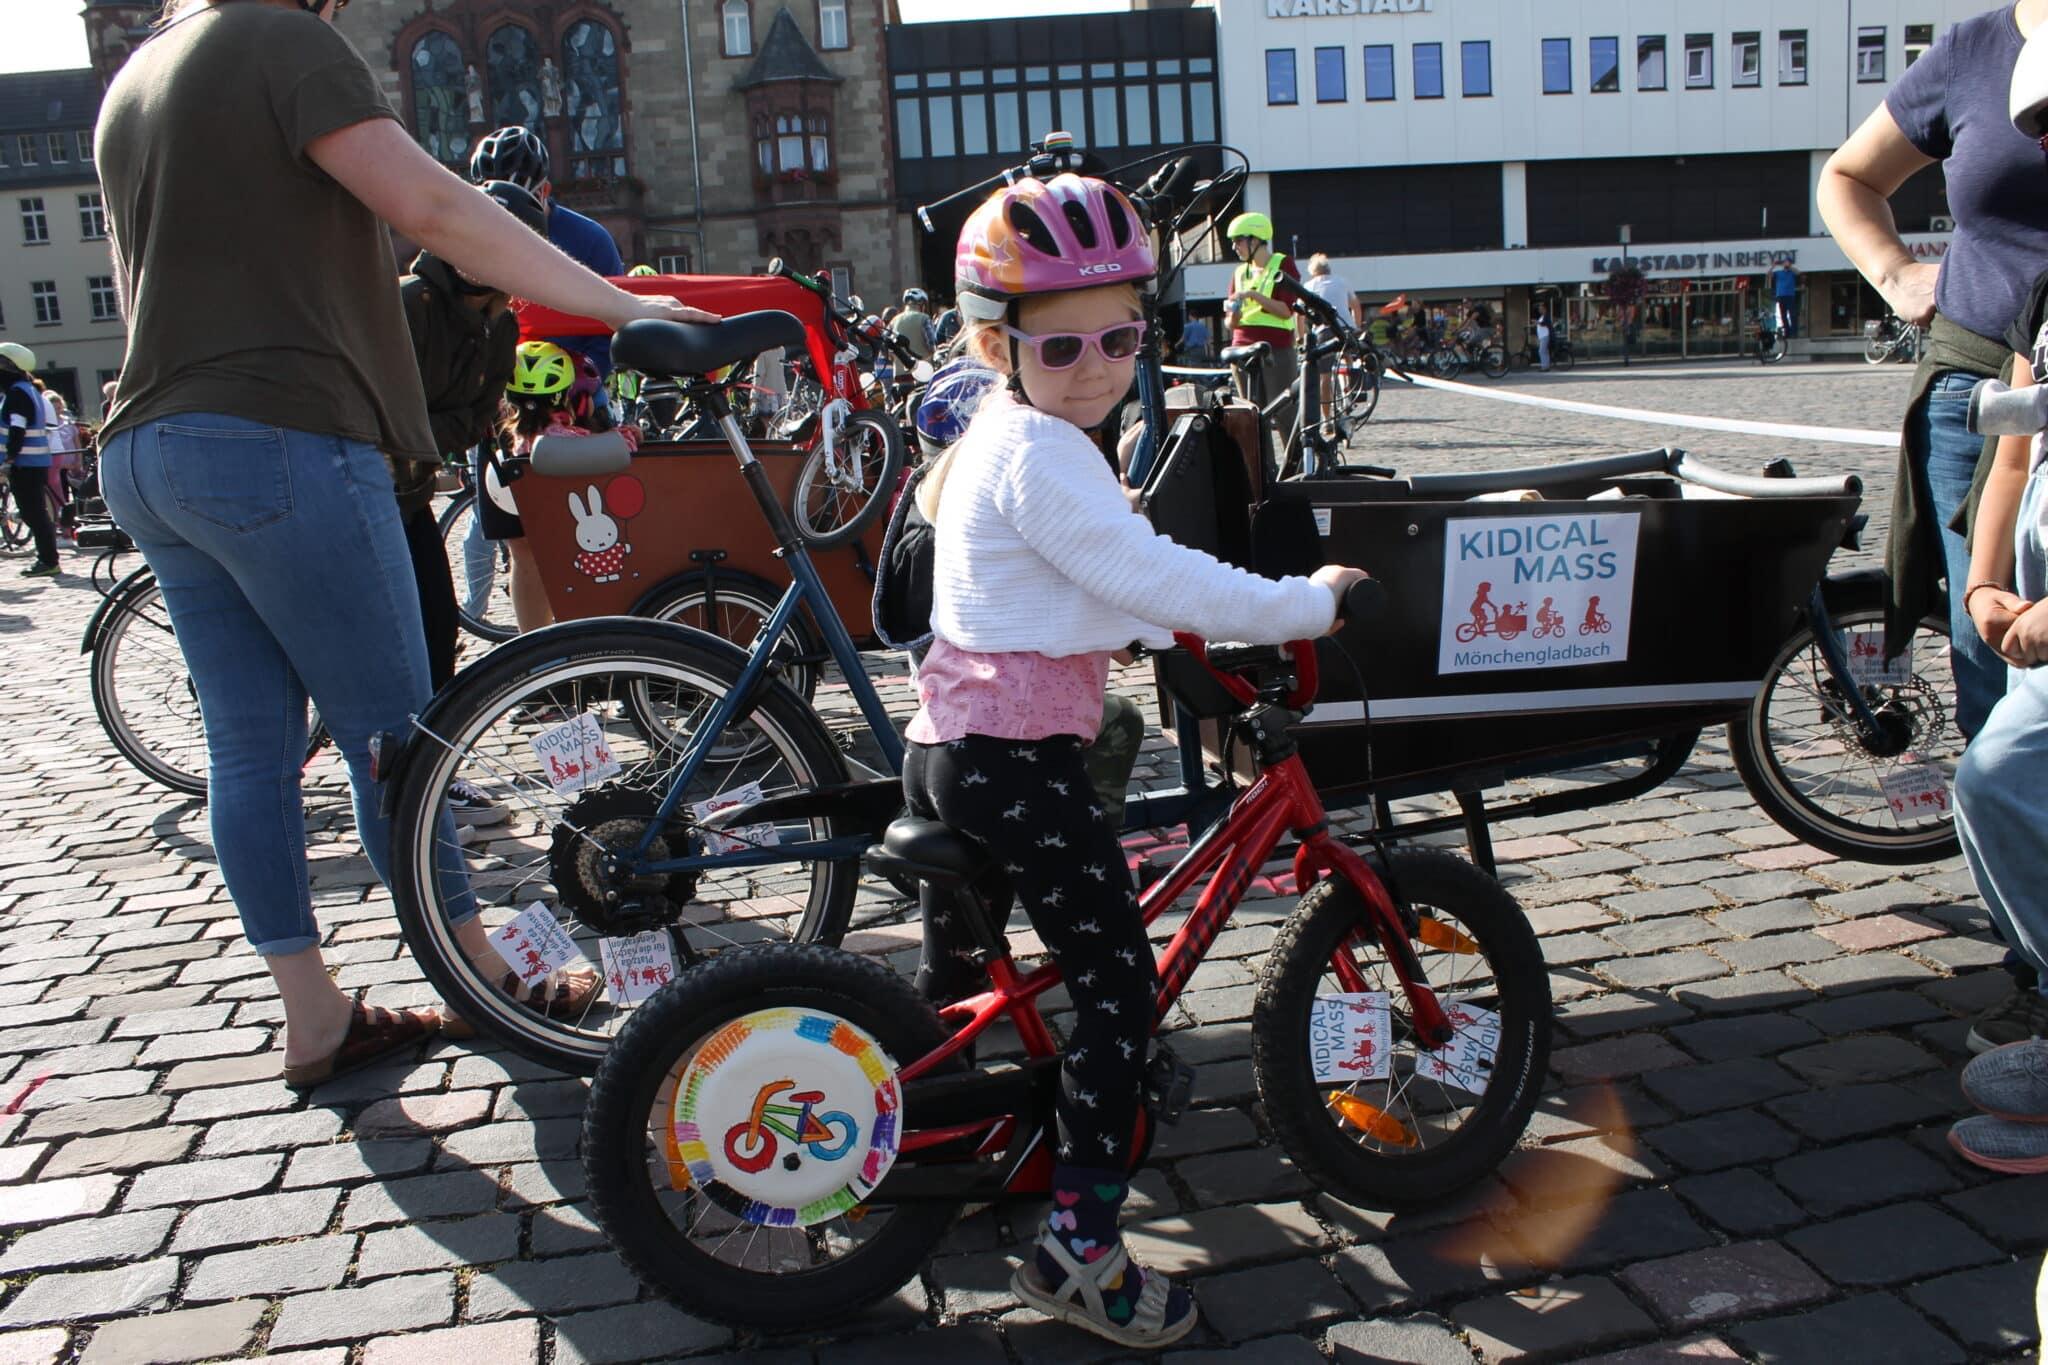 KIDICAL MASS, Mehr sichere Radwege!  Foto: Sebastian Peter